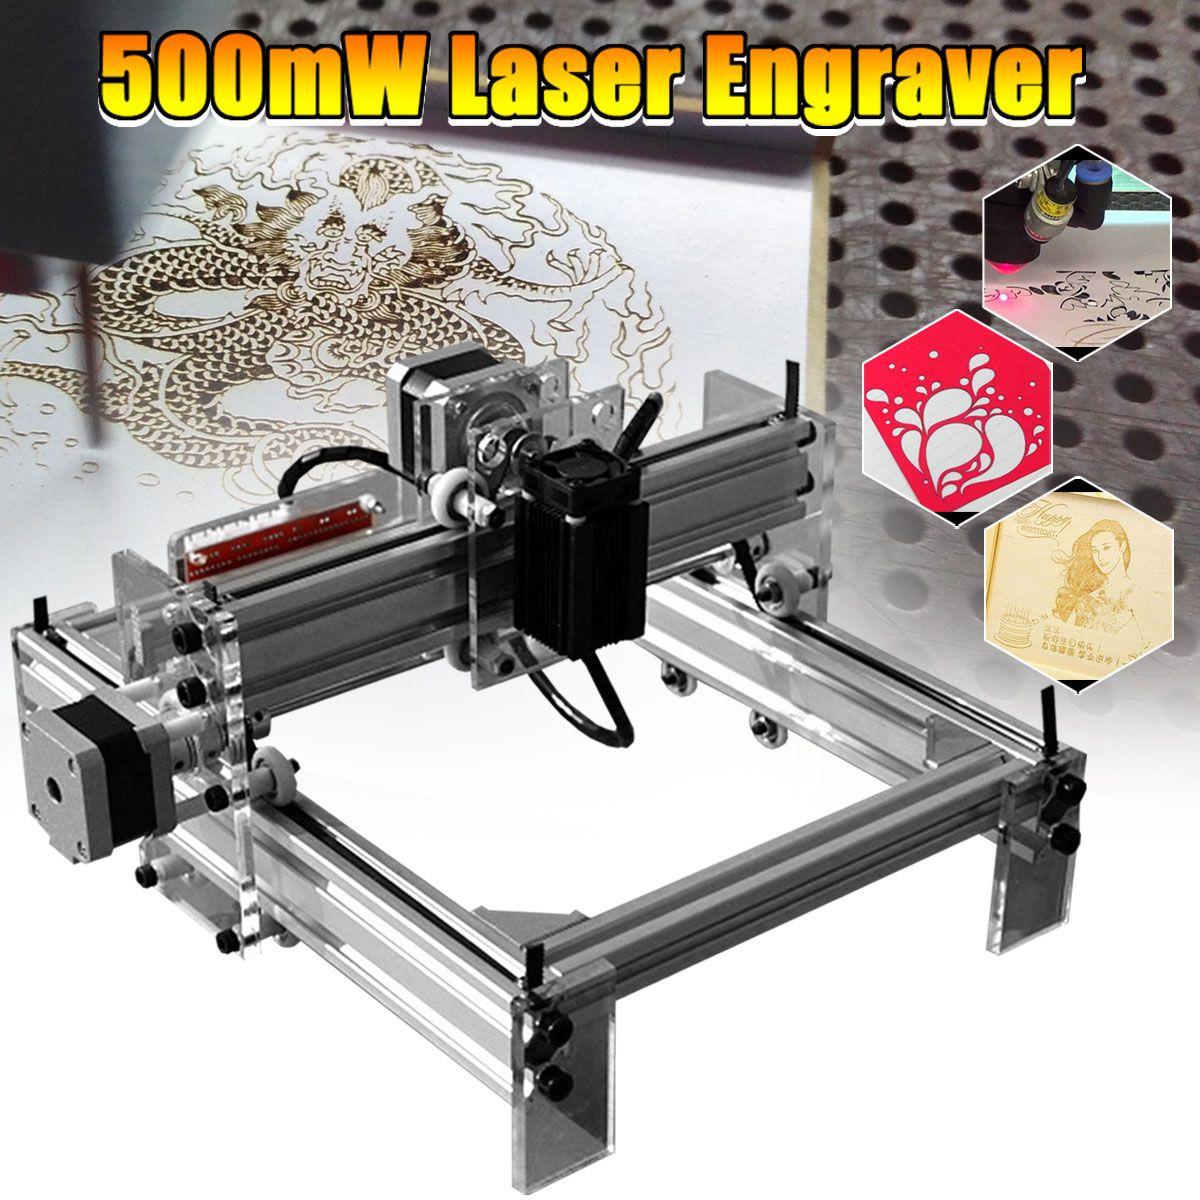 20X17cm 500mW DIY Mini Desktop Blue Laser Engraving Engraver Machine CNC Wood Router/Printer/Cutter/Power Adjust + Laser Goggles